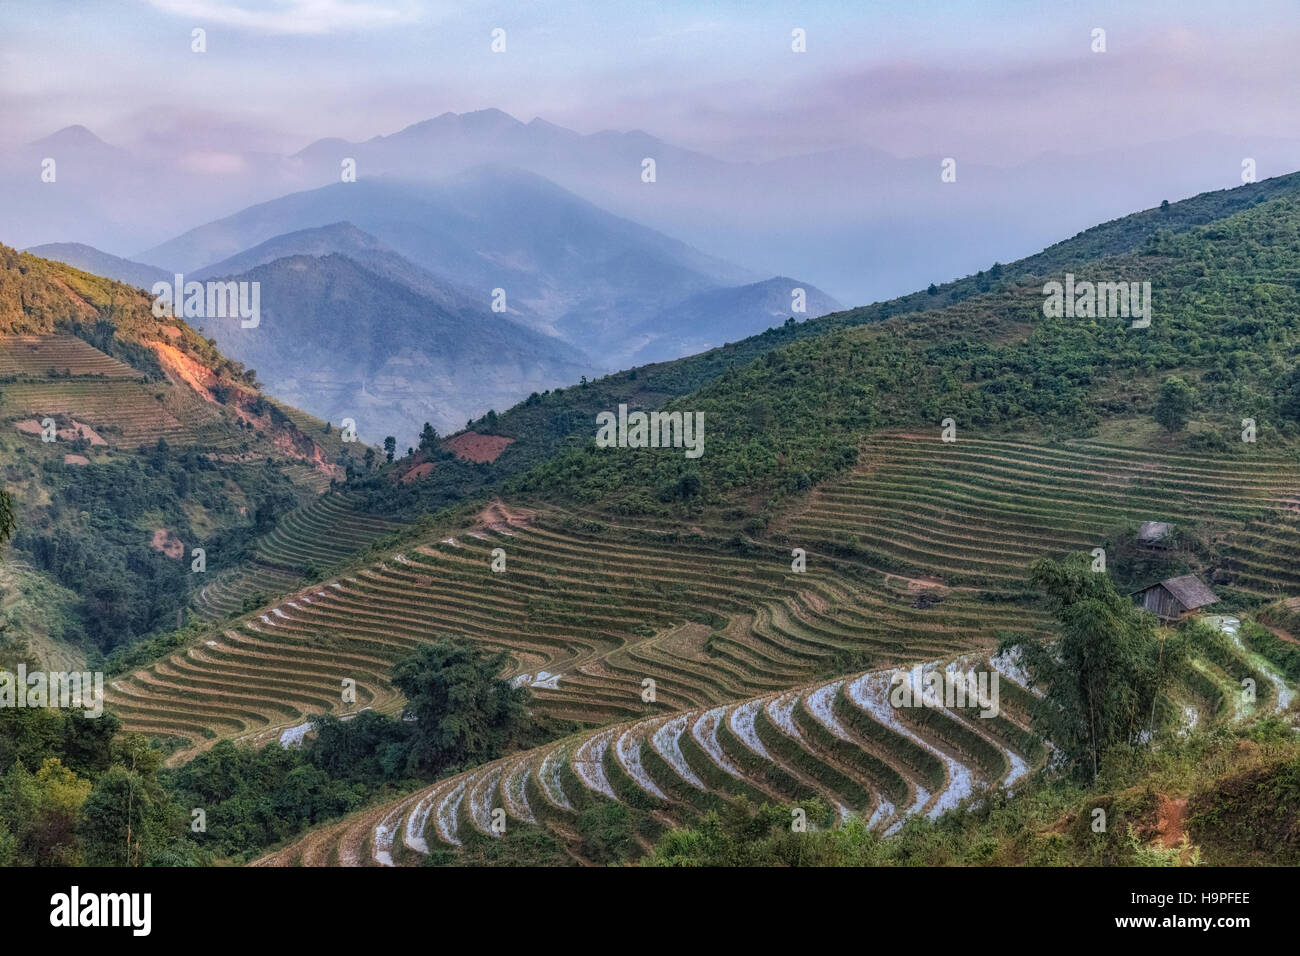 Reis Terrassen, Lao Chai, Sapa, Vietnam, Asien Stockbild